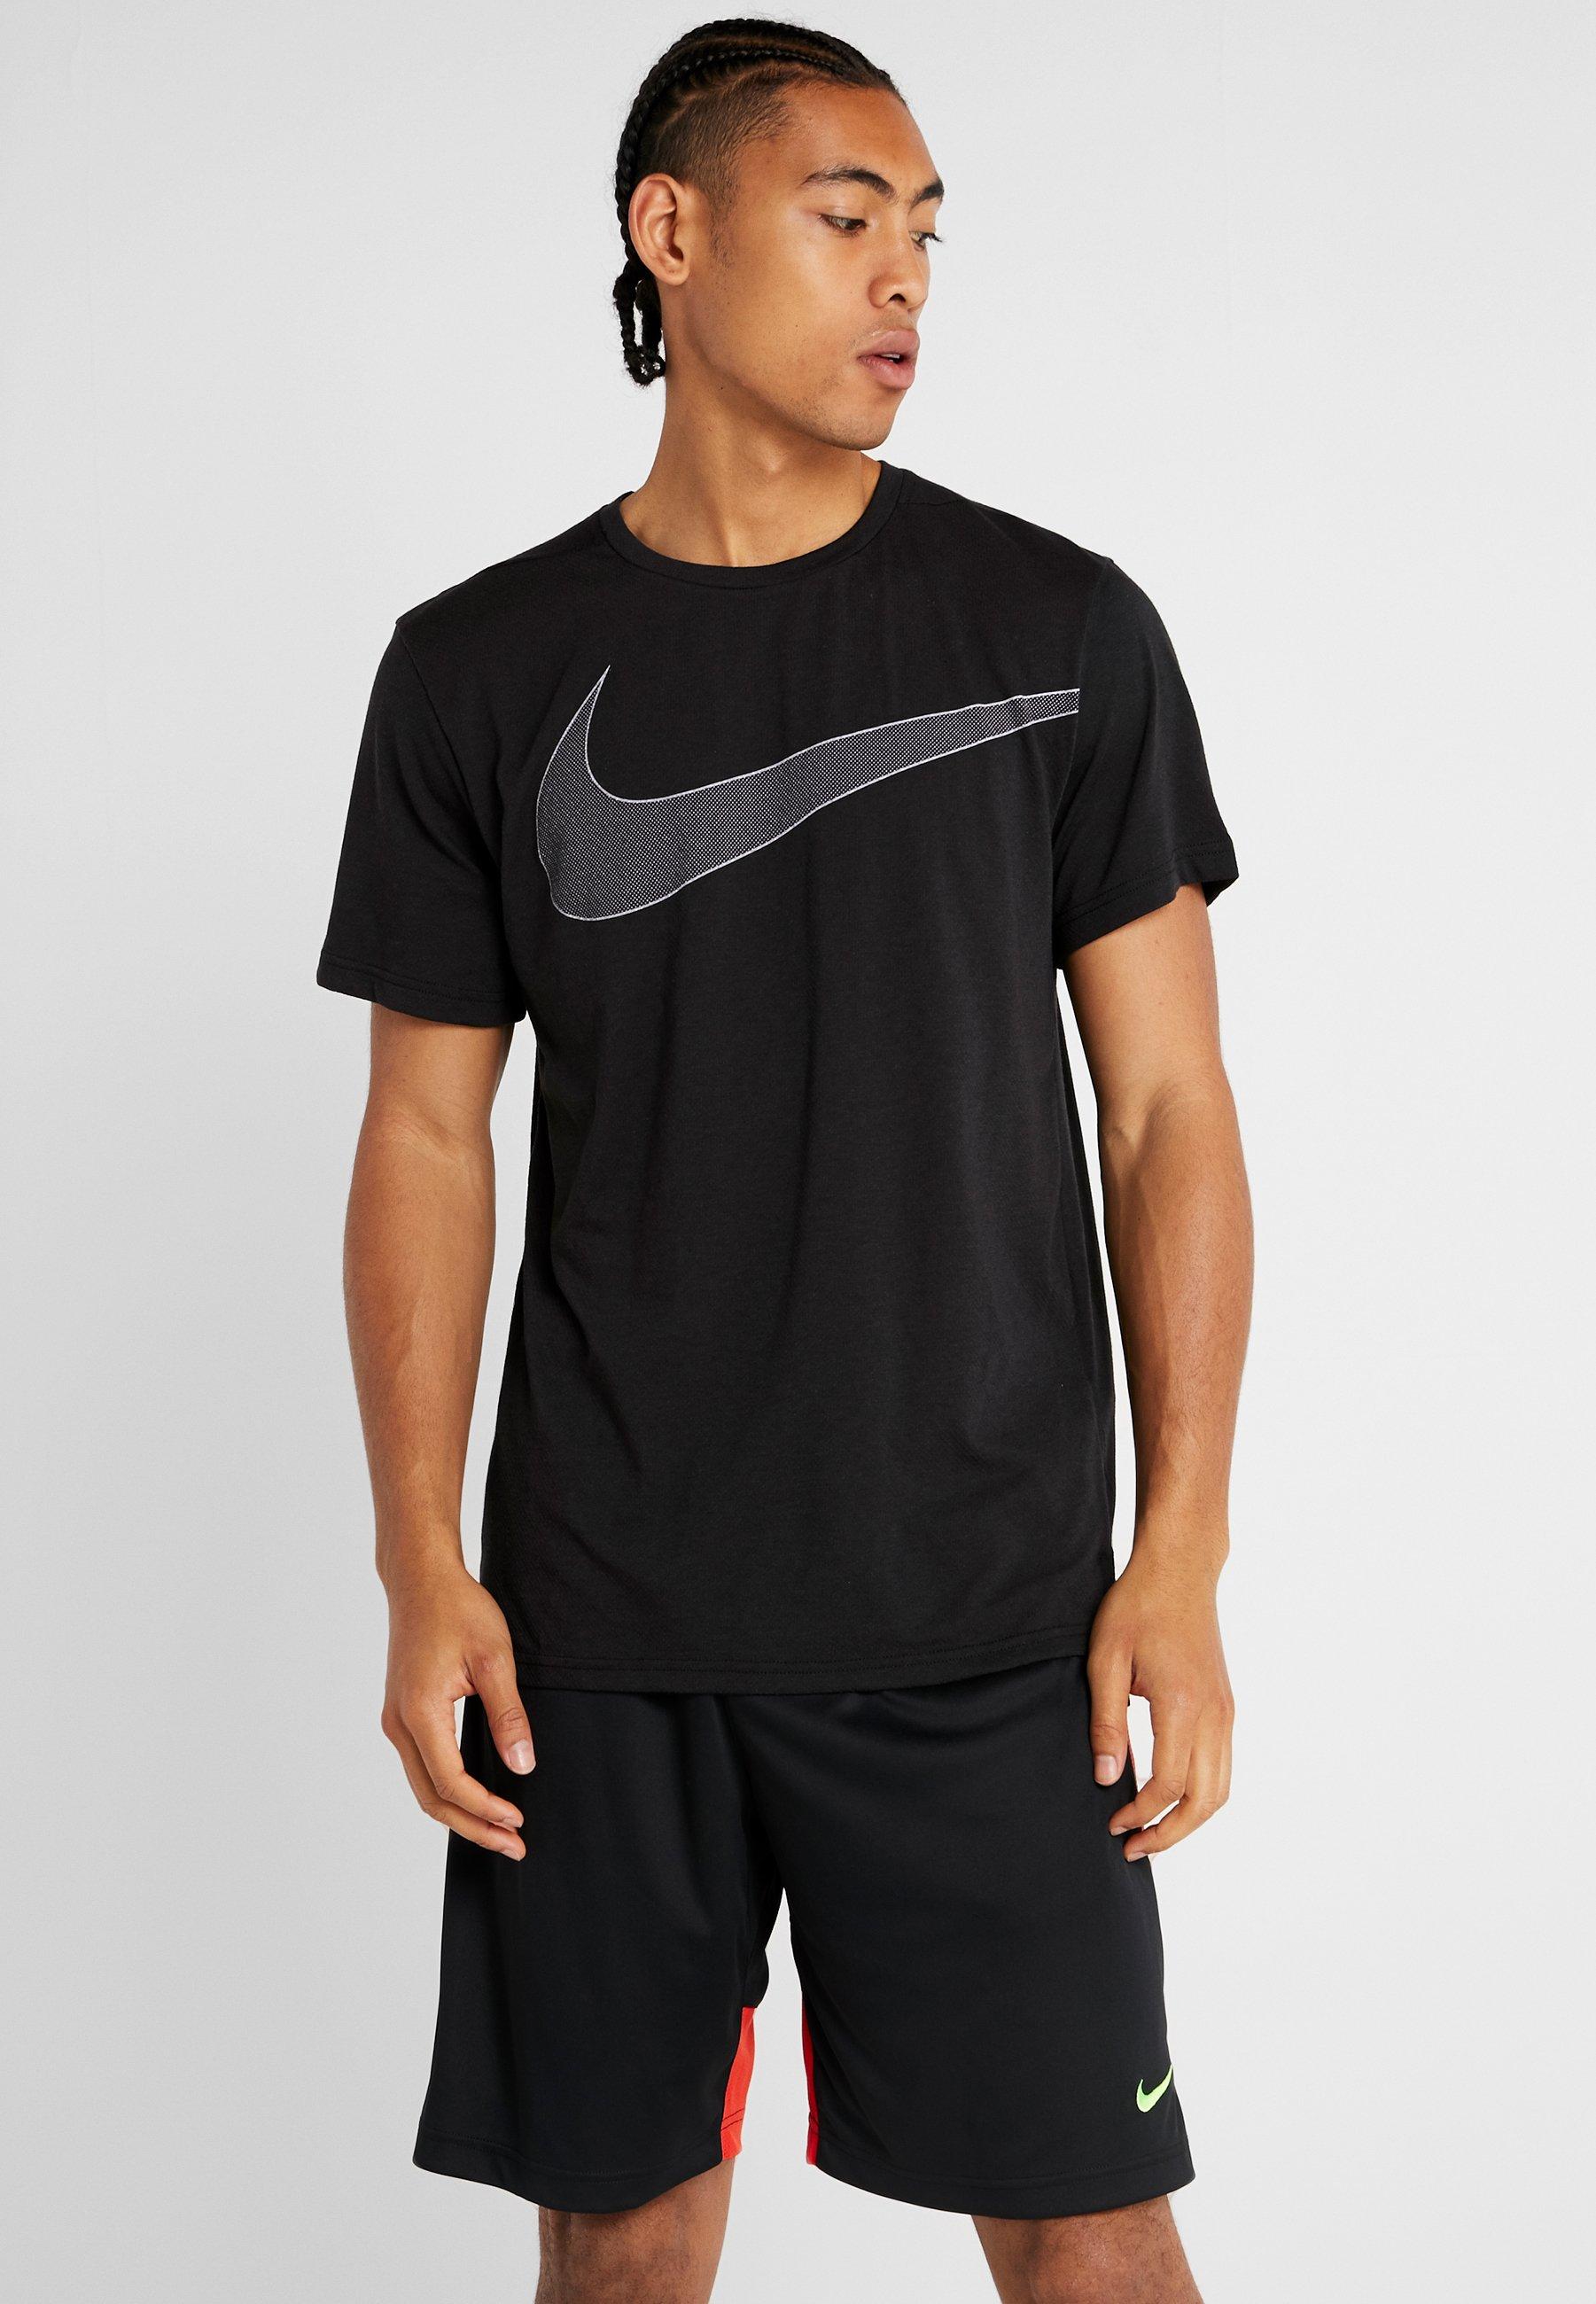 Performance Nike shirt white DryT Imprimé Black sQChtrd